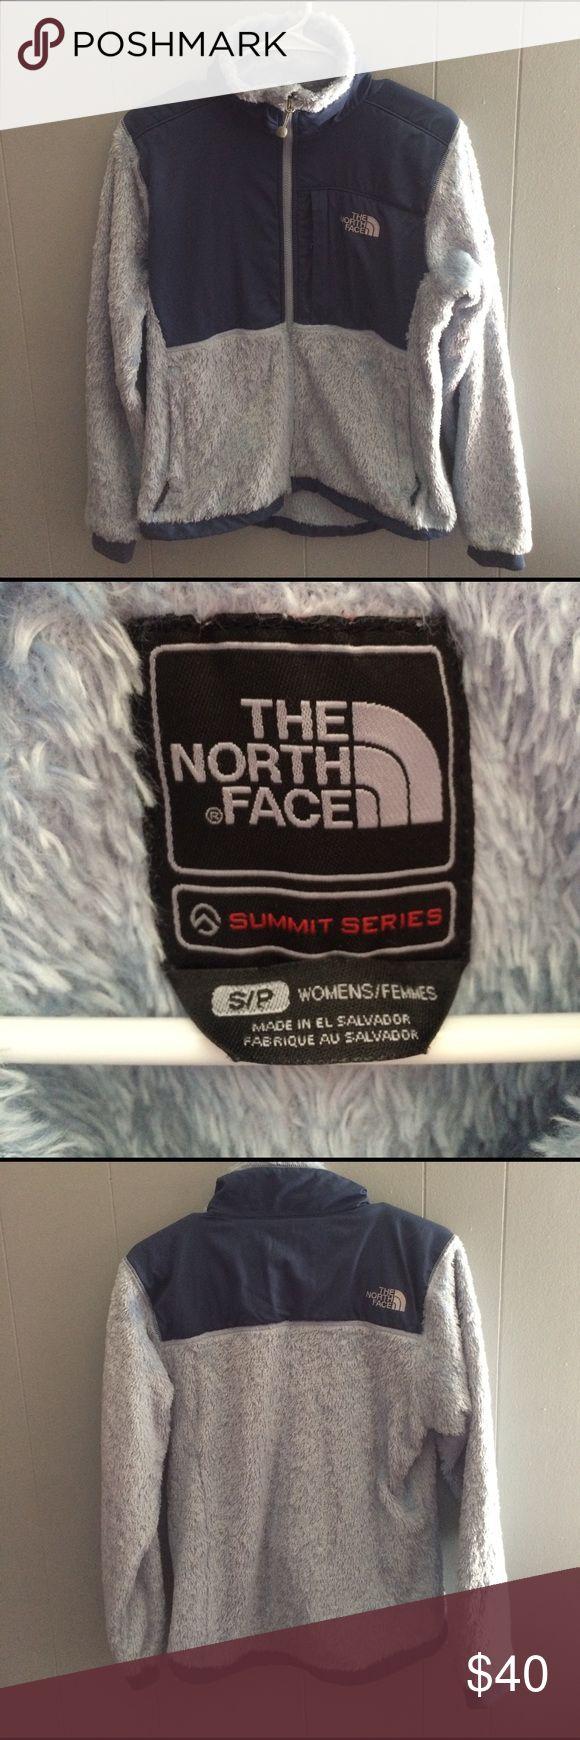 Blue Summit Series North Face Women's Jacket Blue Summit Series North Face Women's Jacket The North Face Jackets & Coats